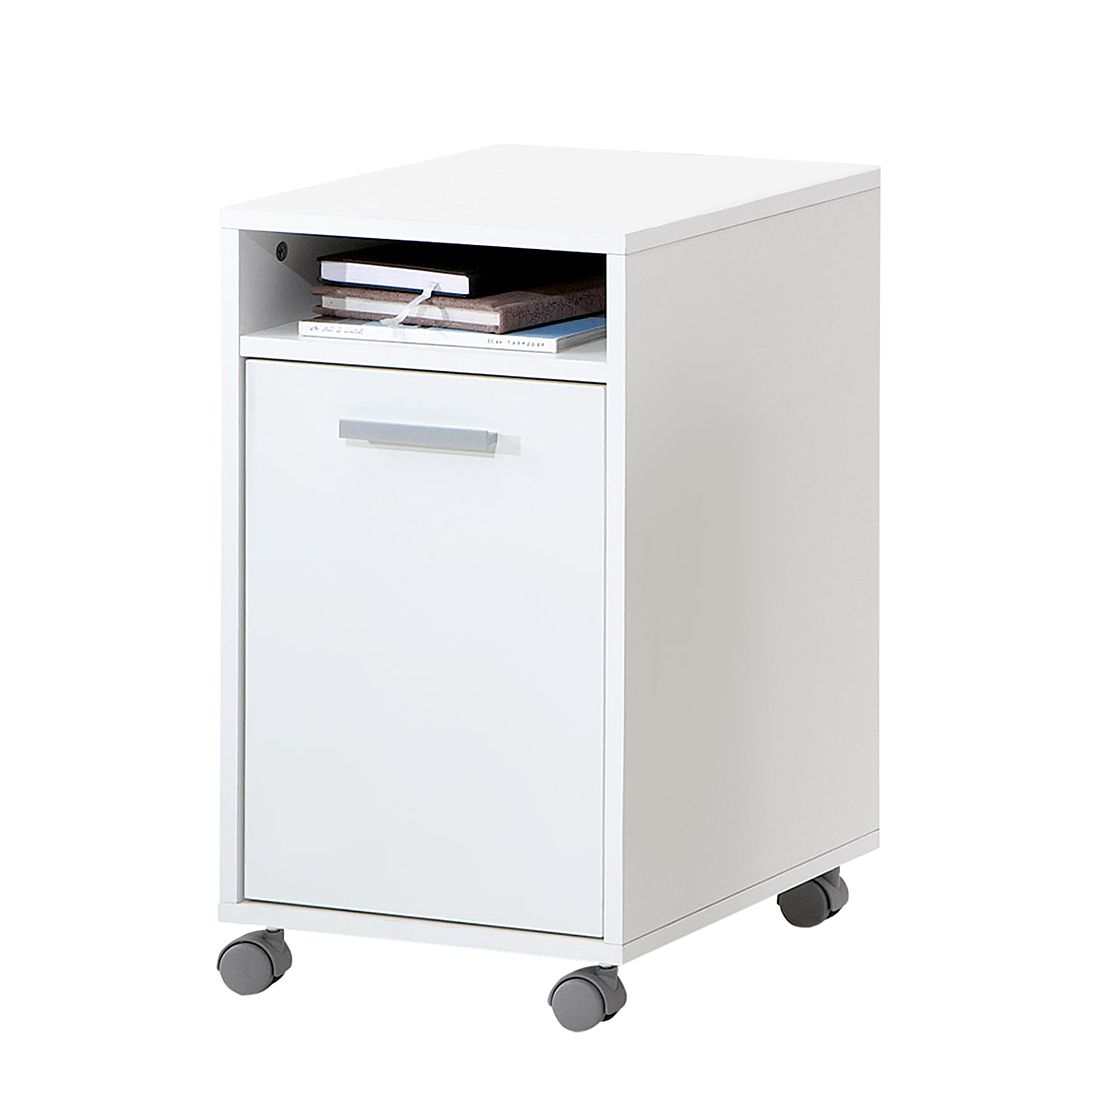 Cassettiera d'ufficio Lanius - Bianco, home24 office